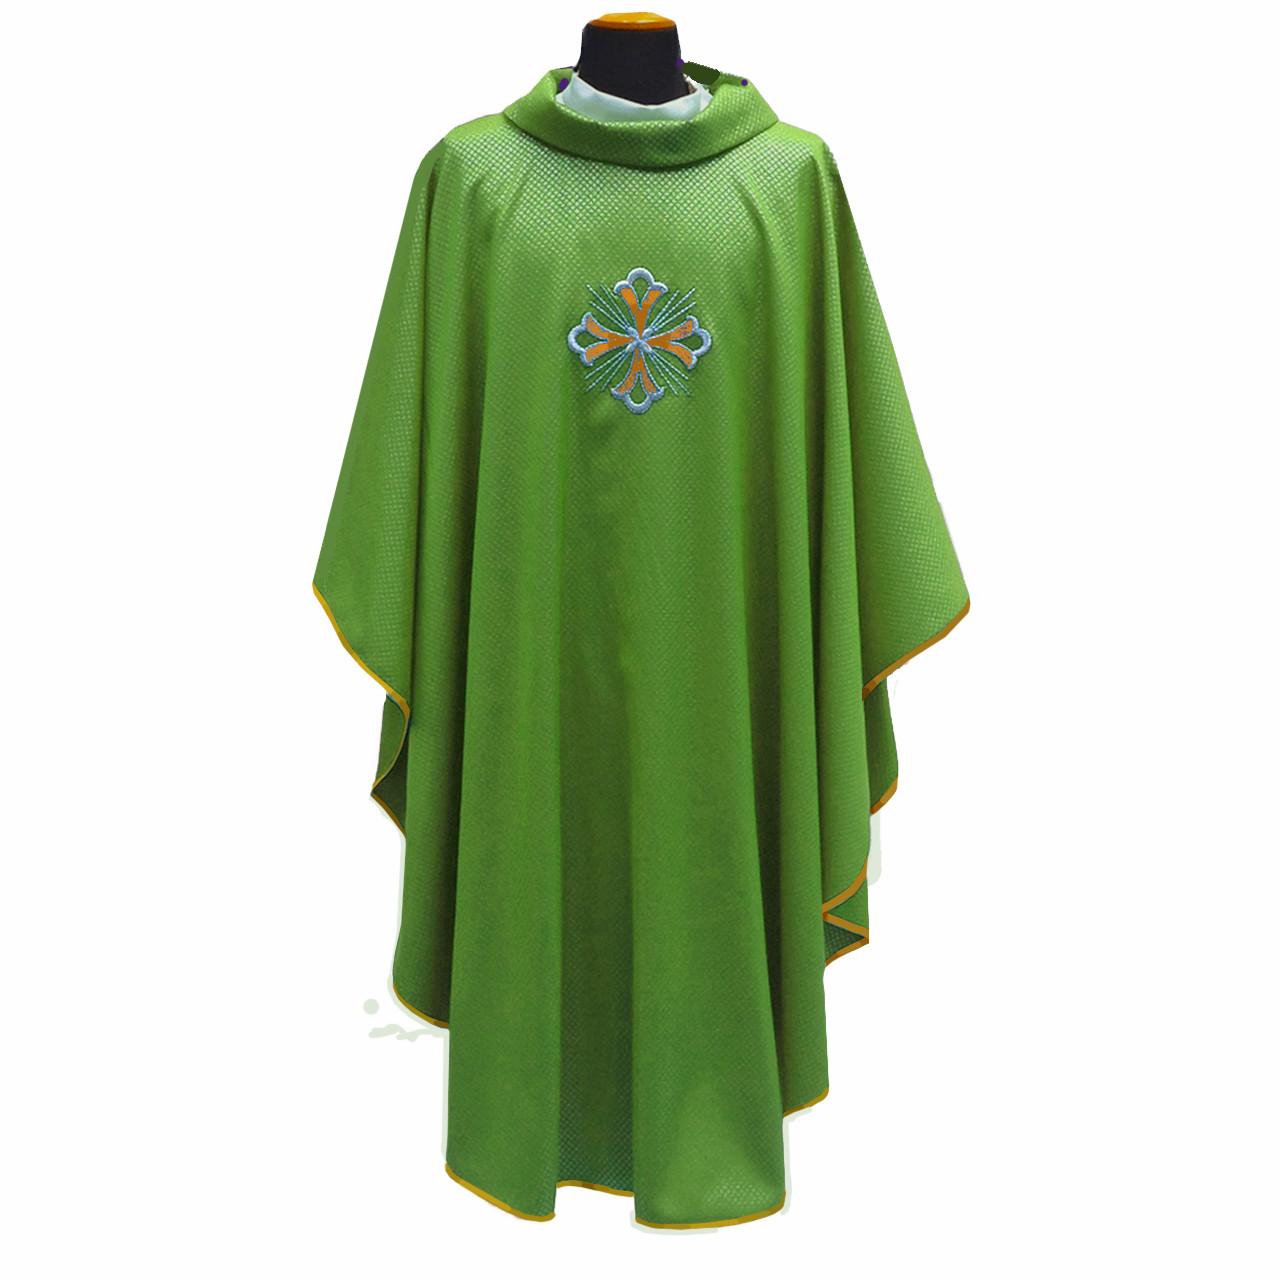 625 Chasuble in Sinai Fabric